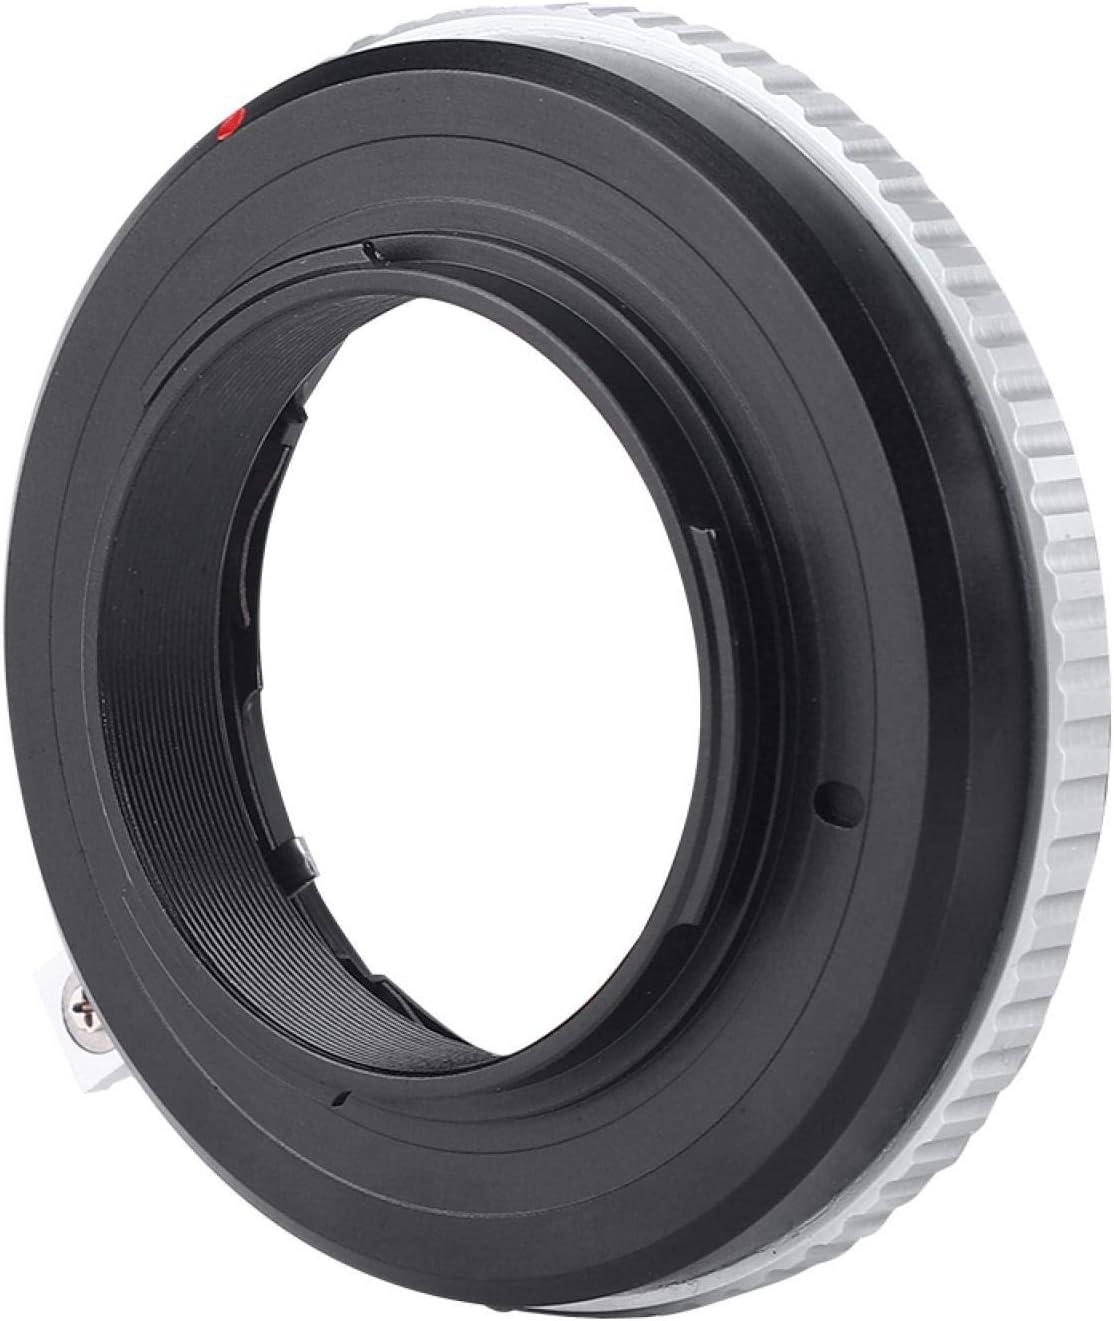 New product type DAUERHAFT quality assurance Aluminum Alloy Lens Adapter Bla Useful Exposure Manual